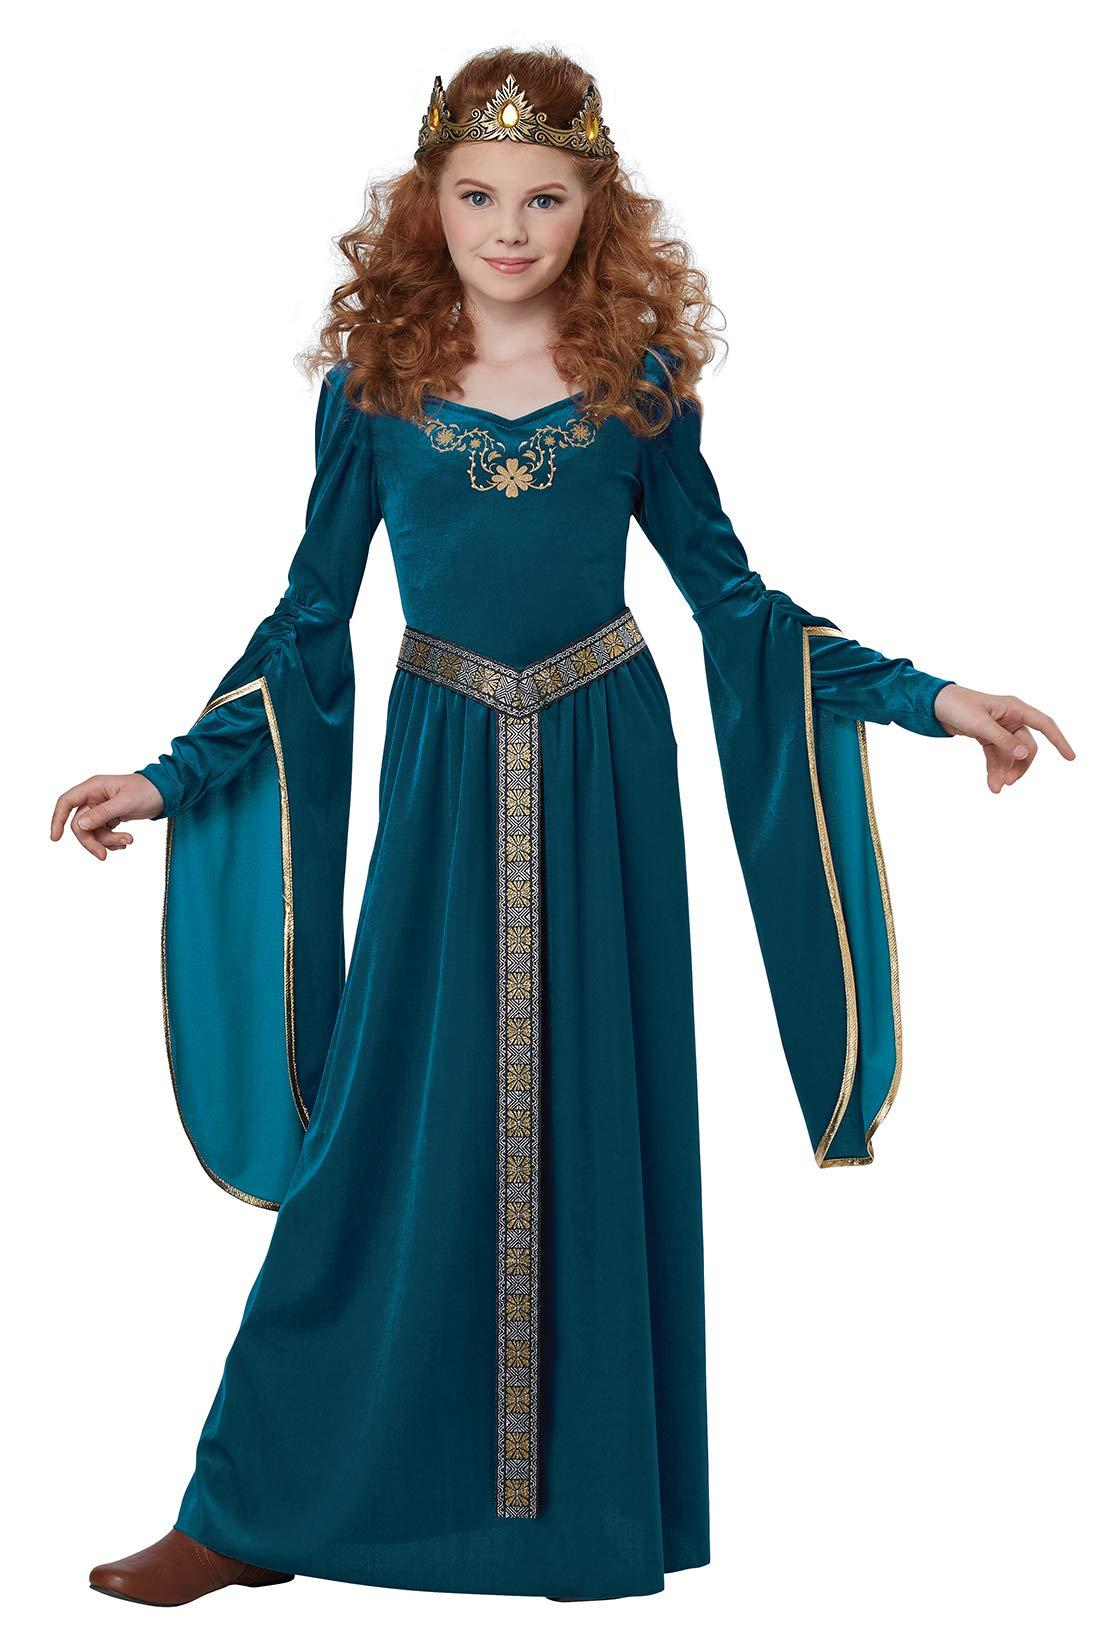 Cute Adorable Medieval Time Era Royal Princess Dress Costume Child Girls